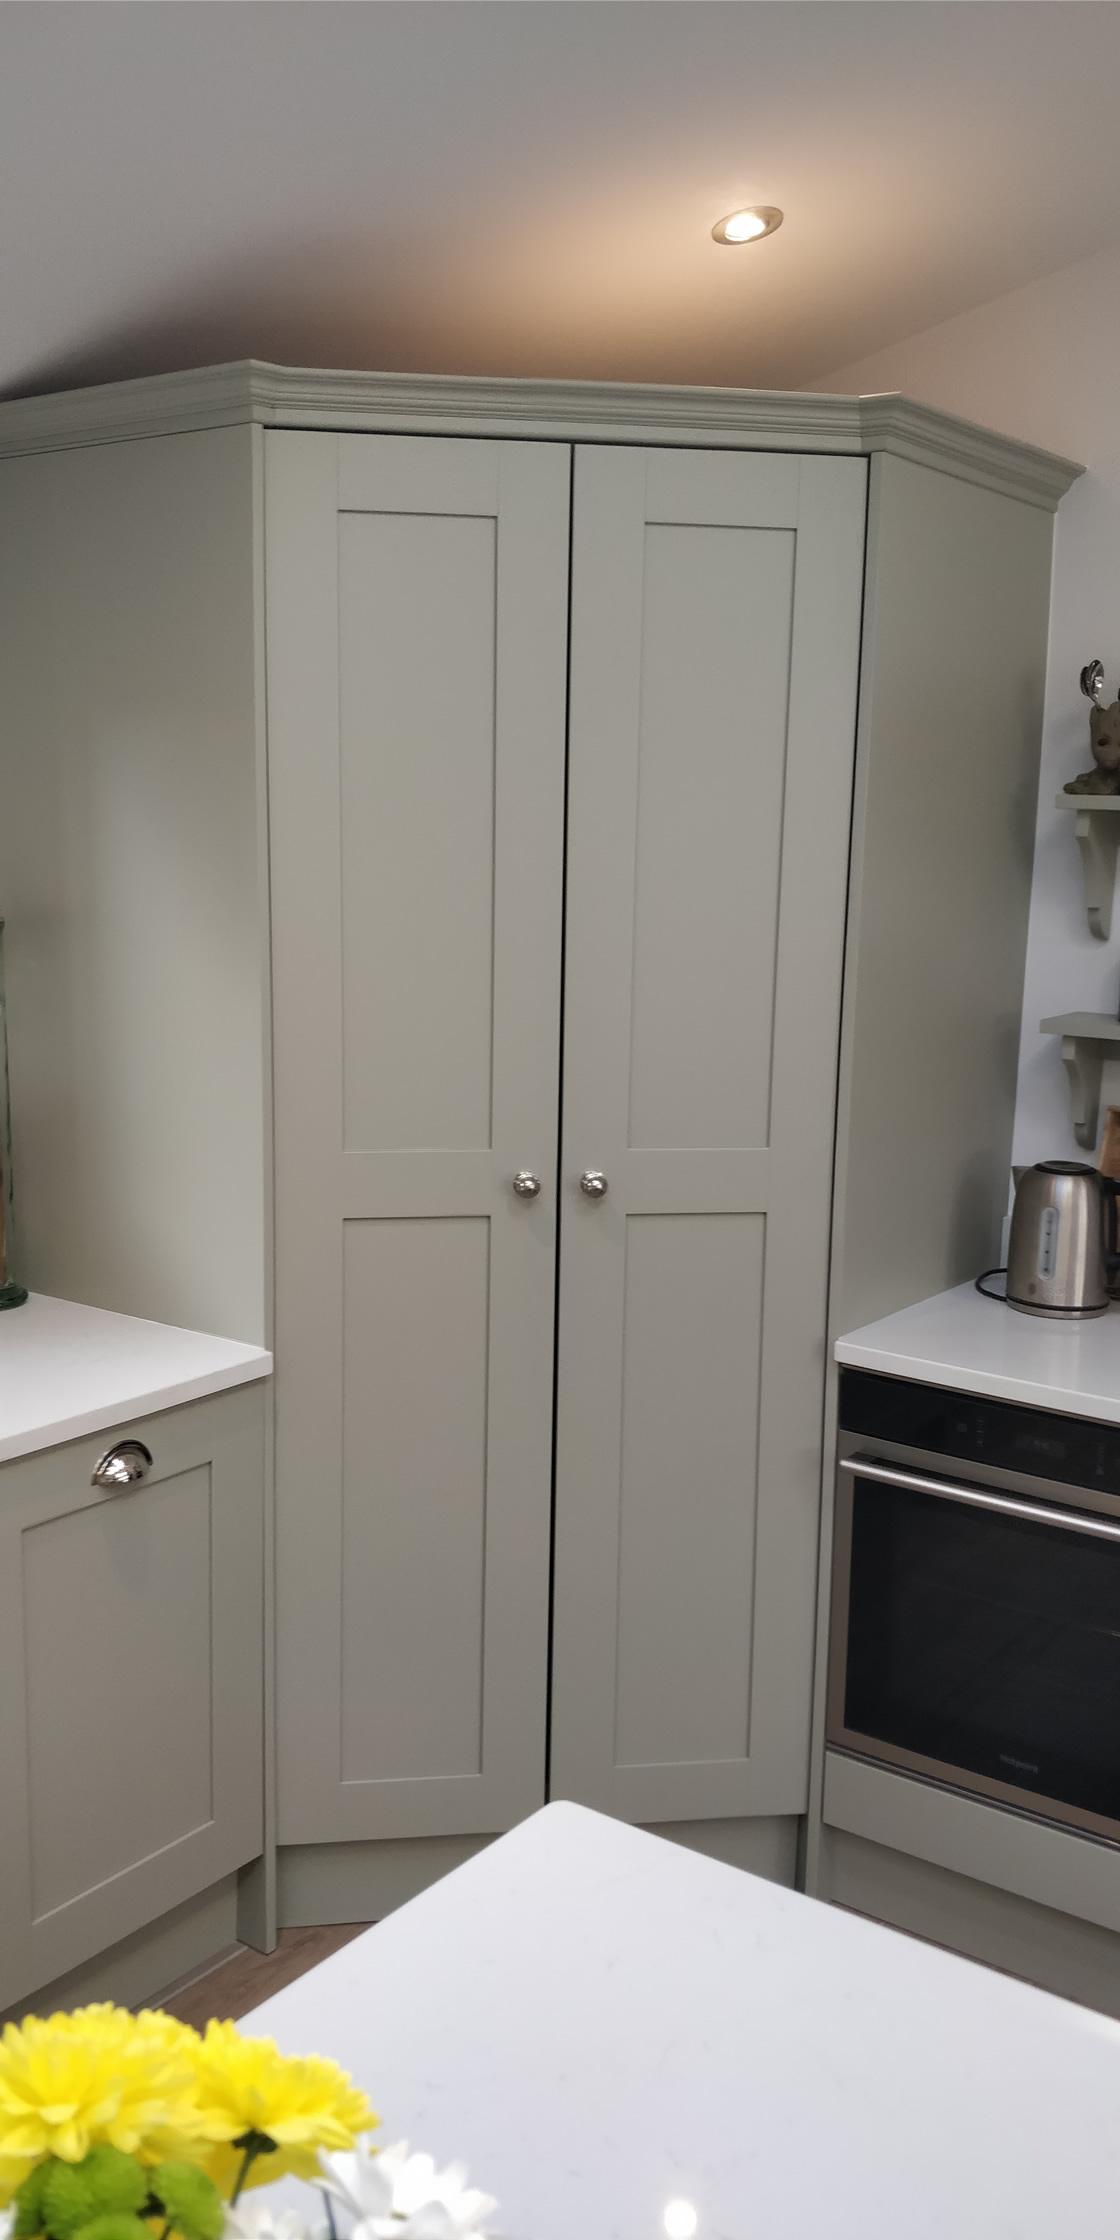 Large Crawley Bespoke Kitchen Larder Design